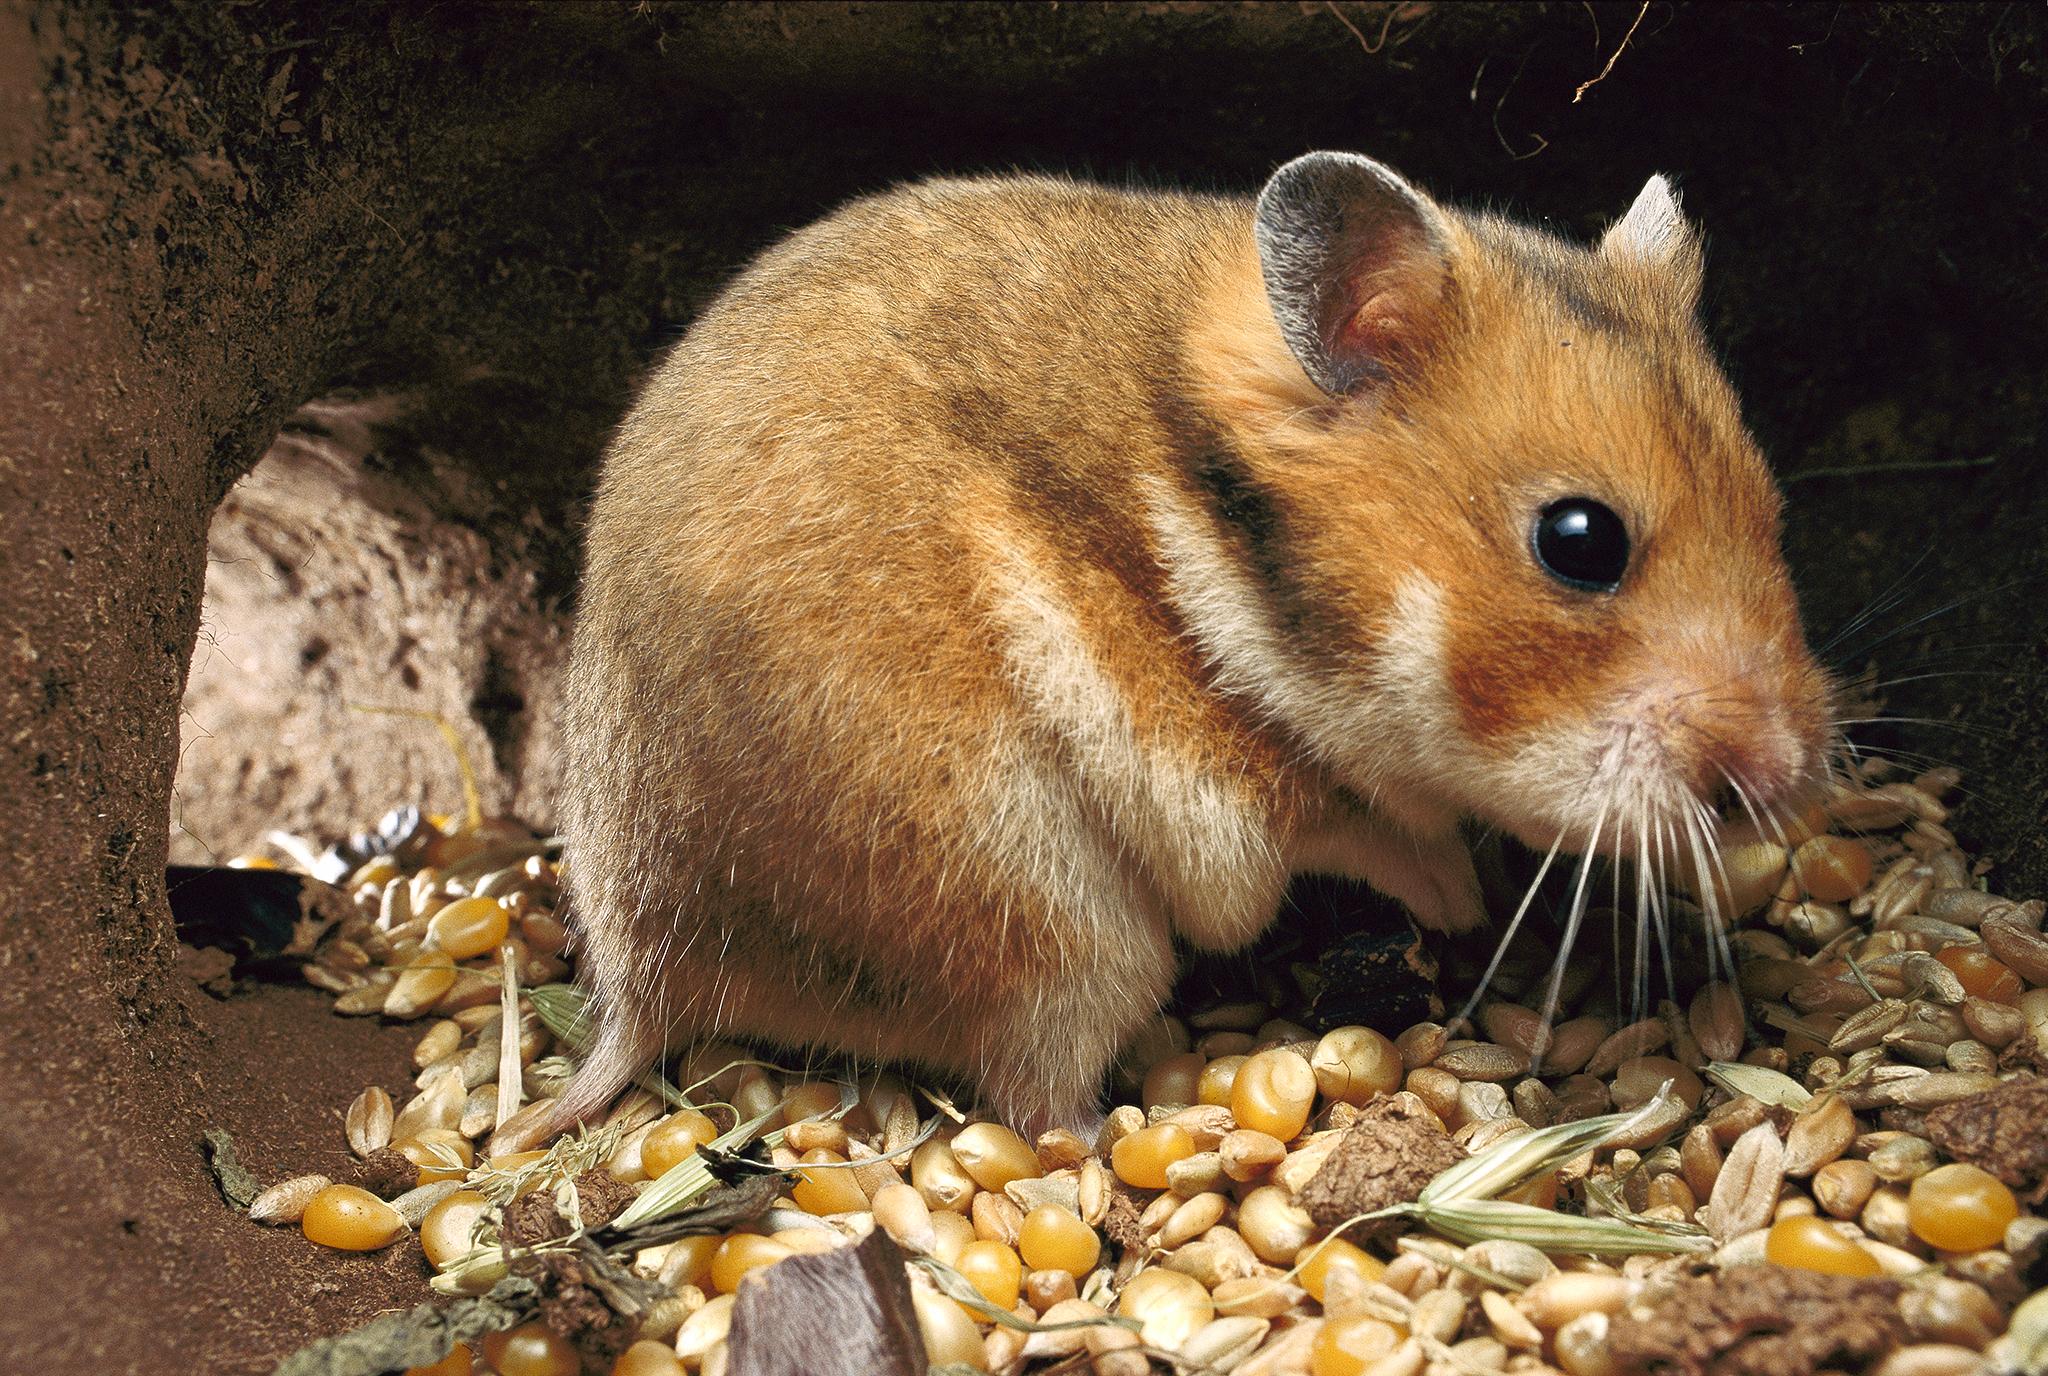 Hamster Hd Wallpaper